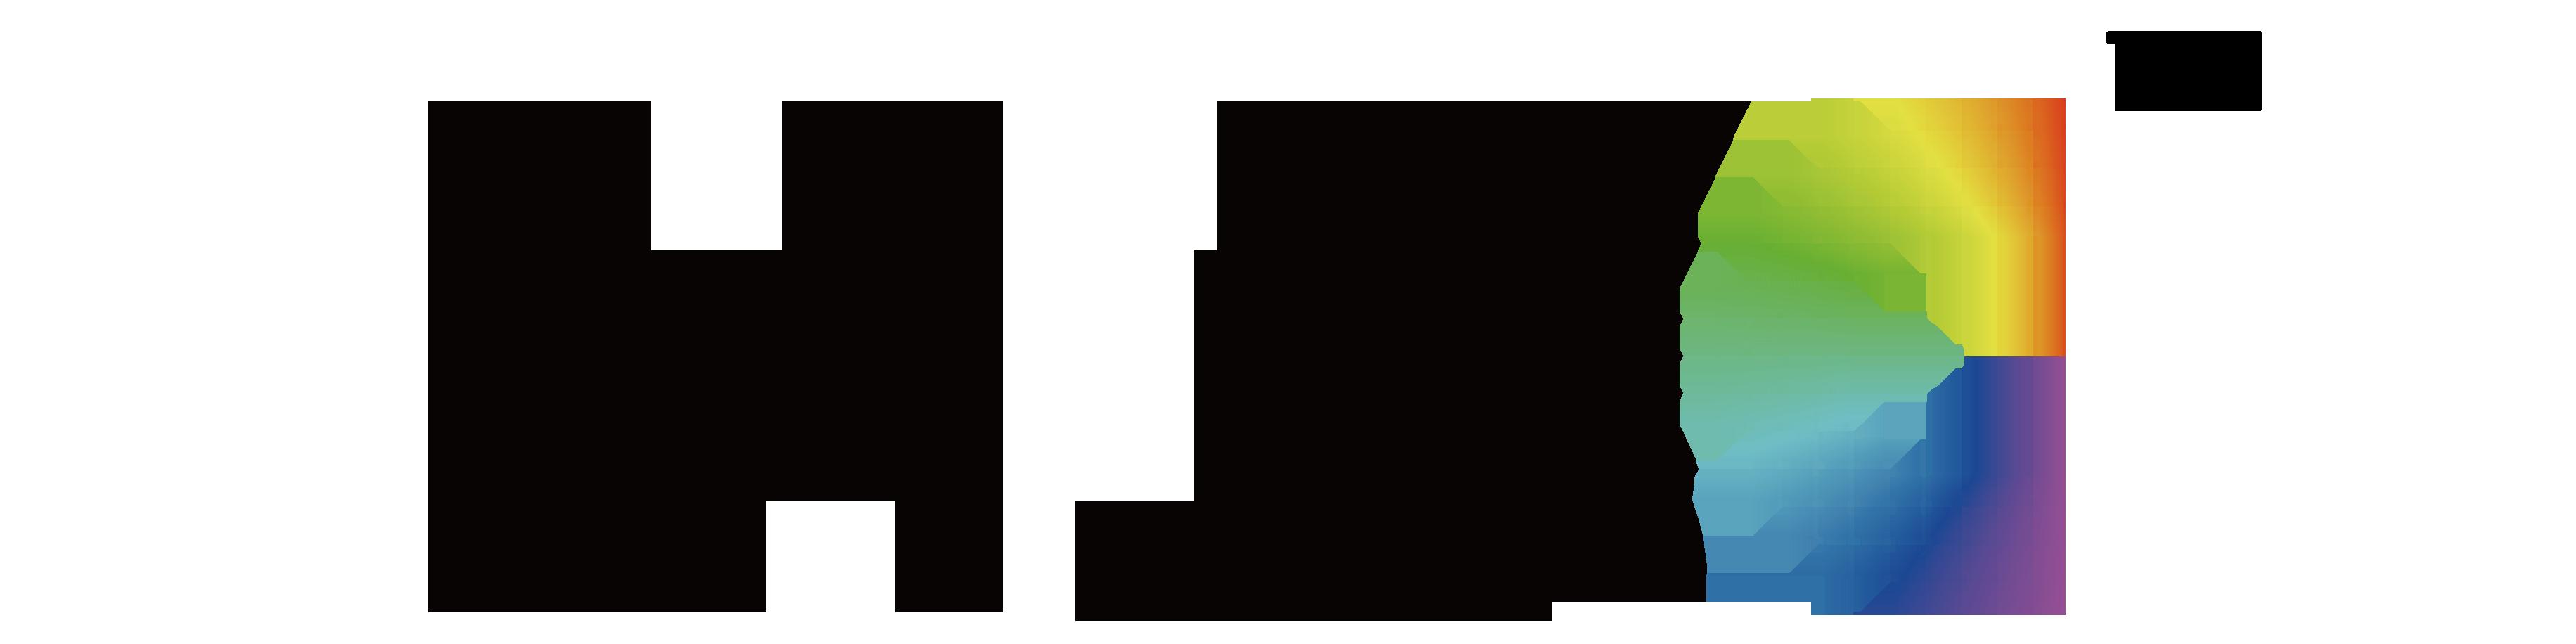 mjjcled.com